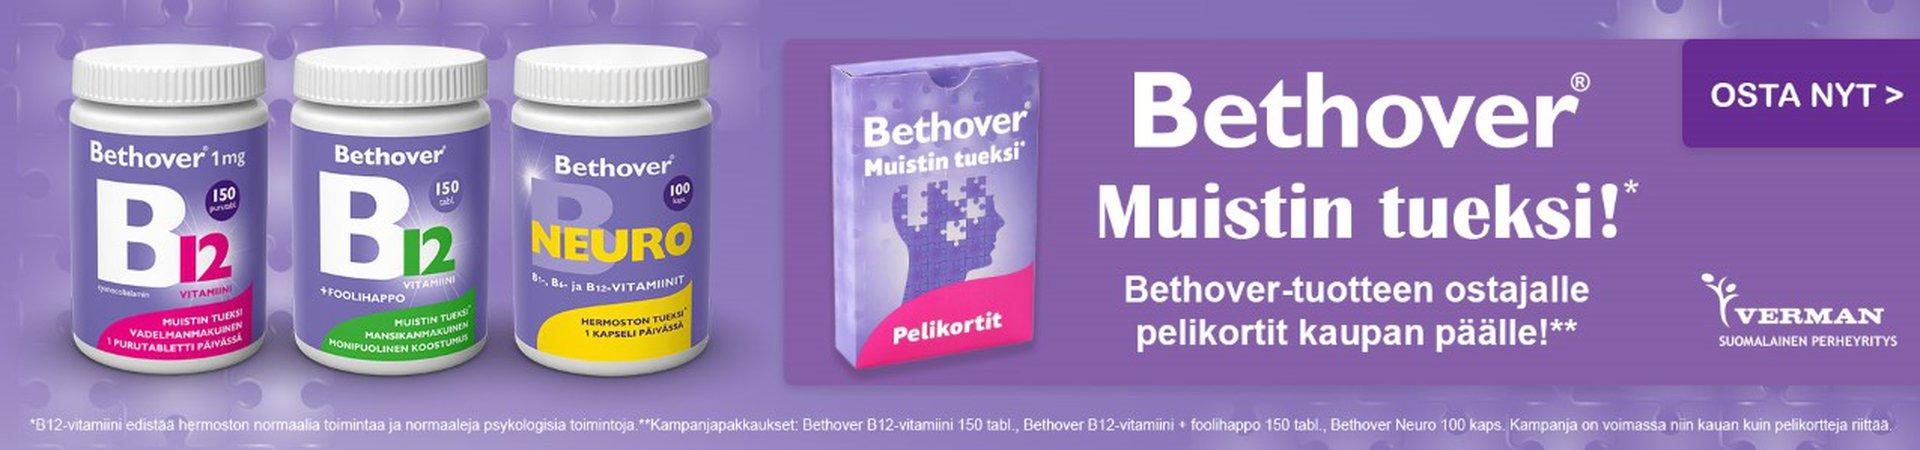 Bethover